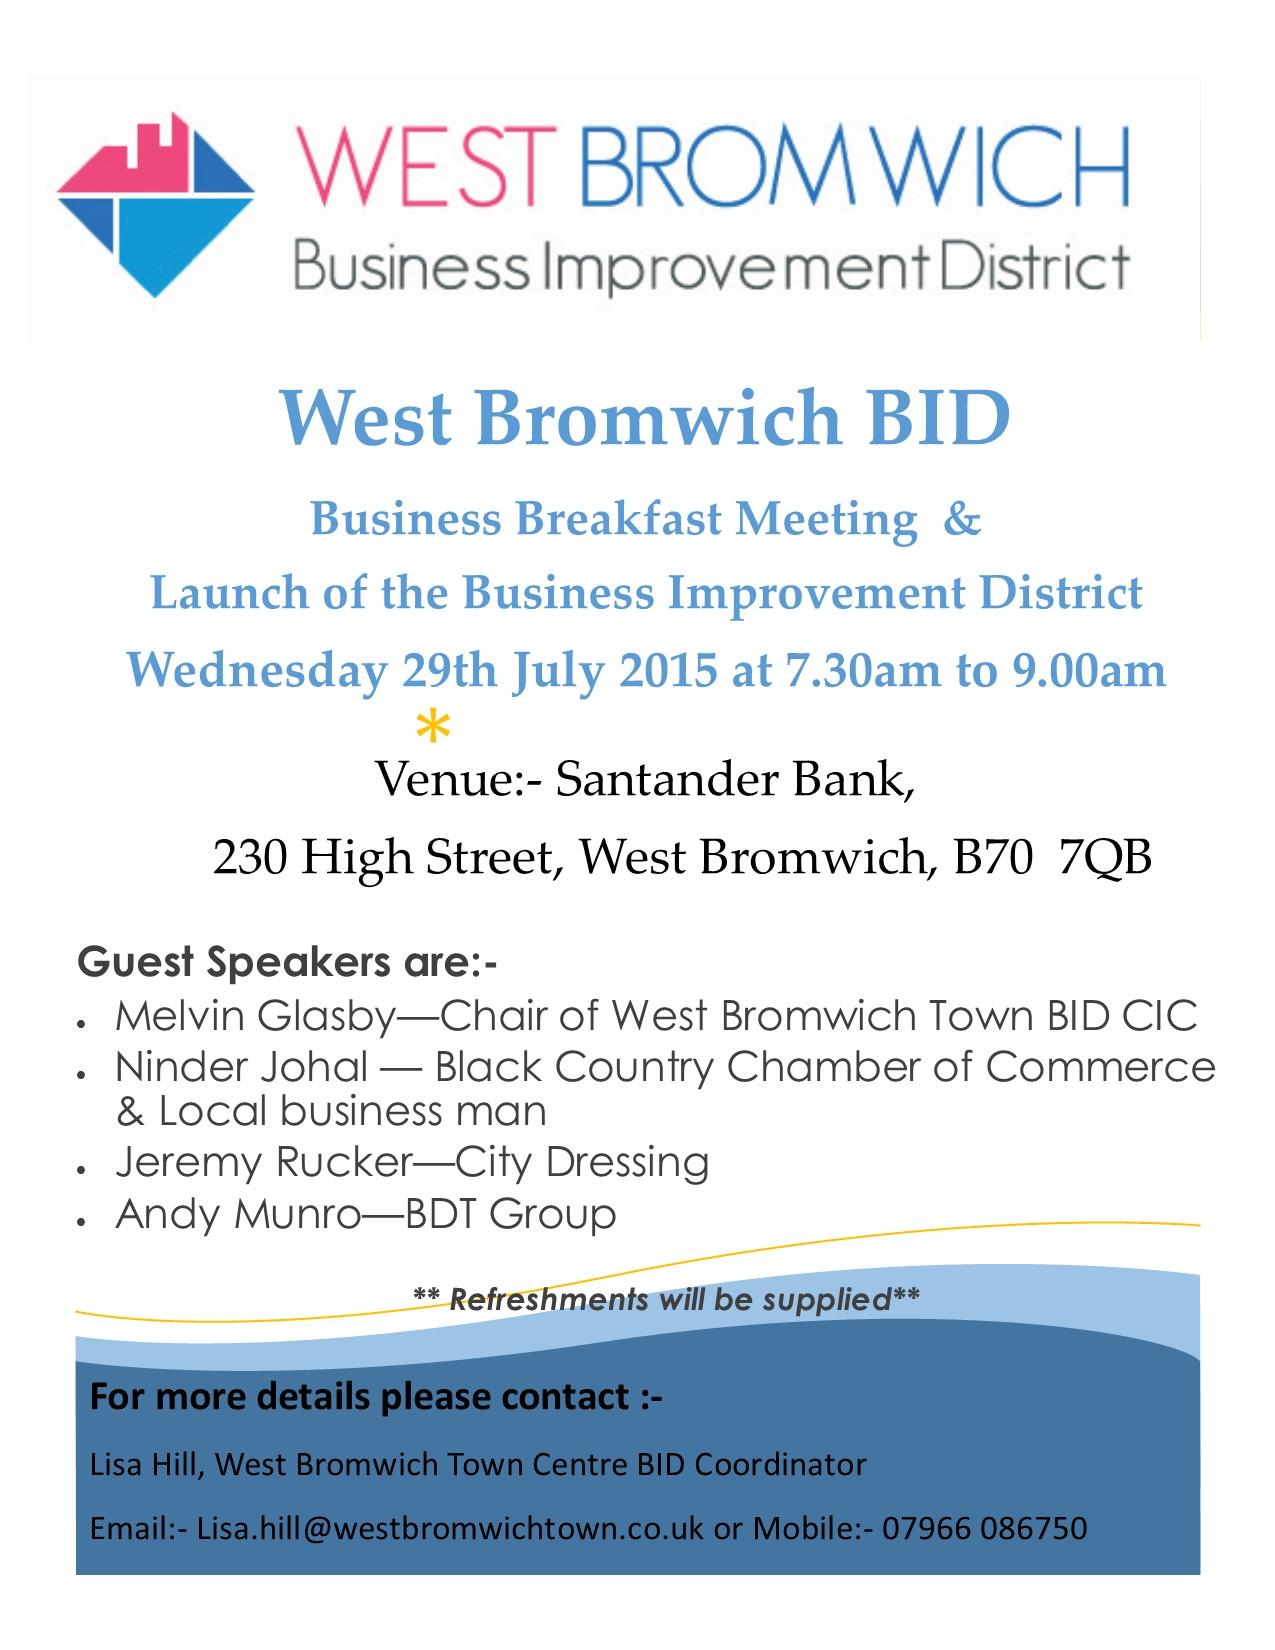 West Bromwich Town BID Breakfast Meeting **TOMORROW**